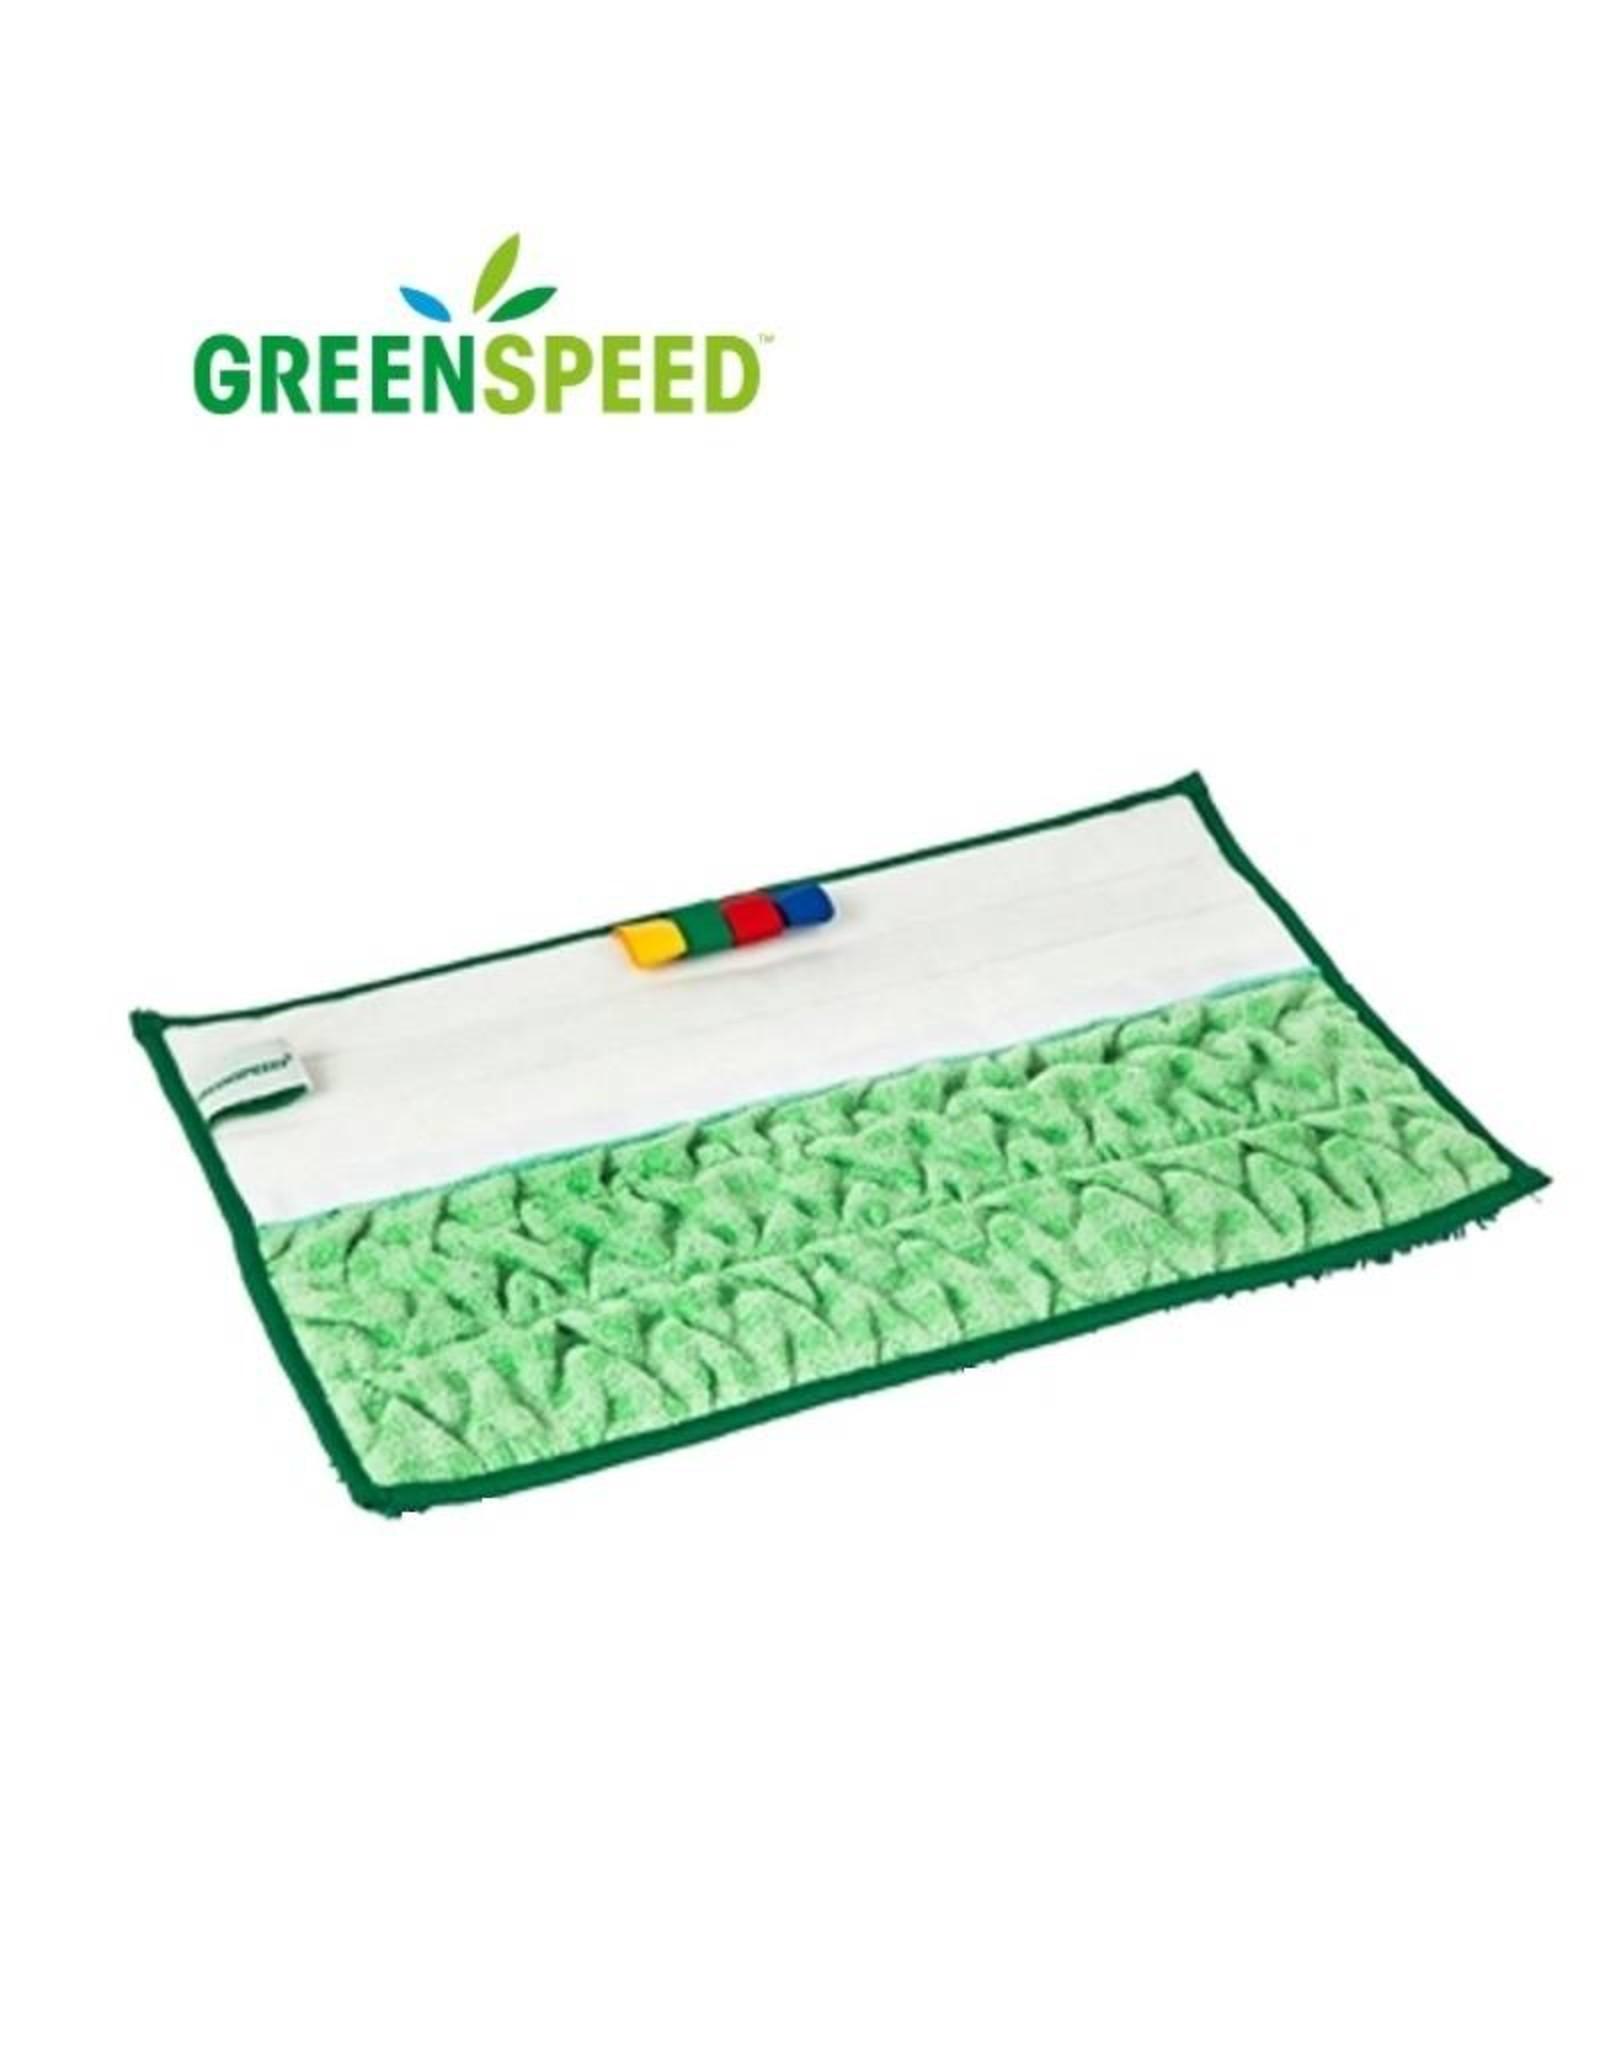 Greenspeed TrioTec Diamond mop